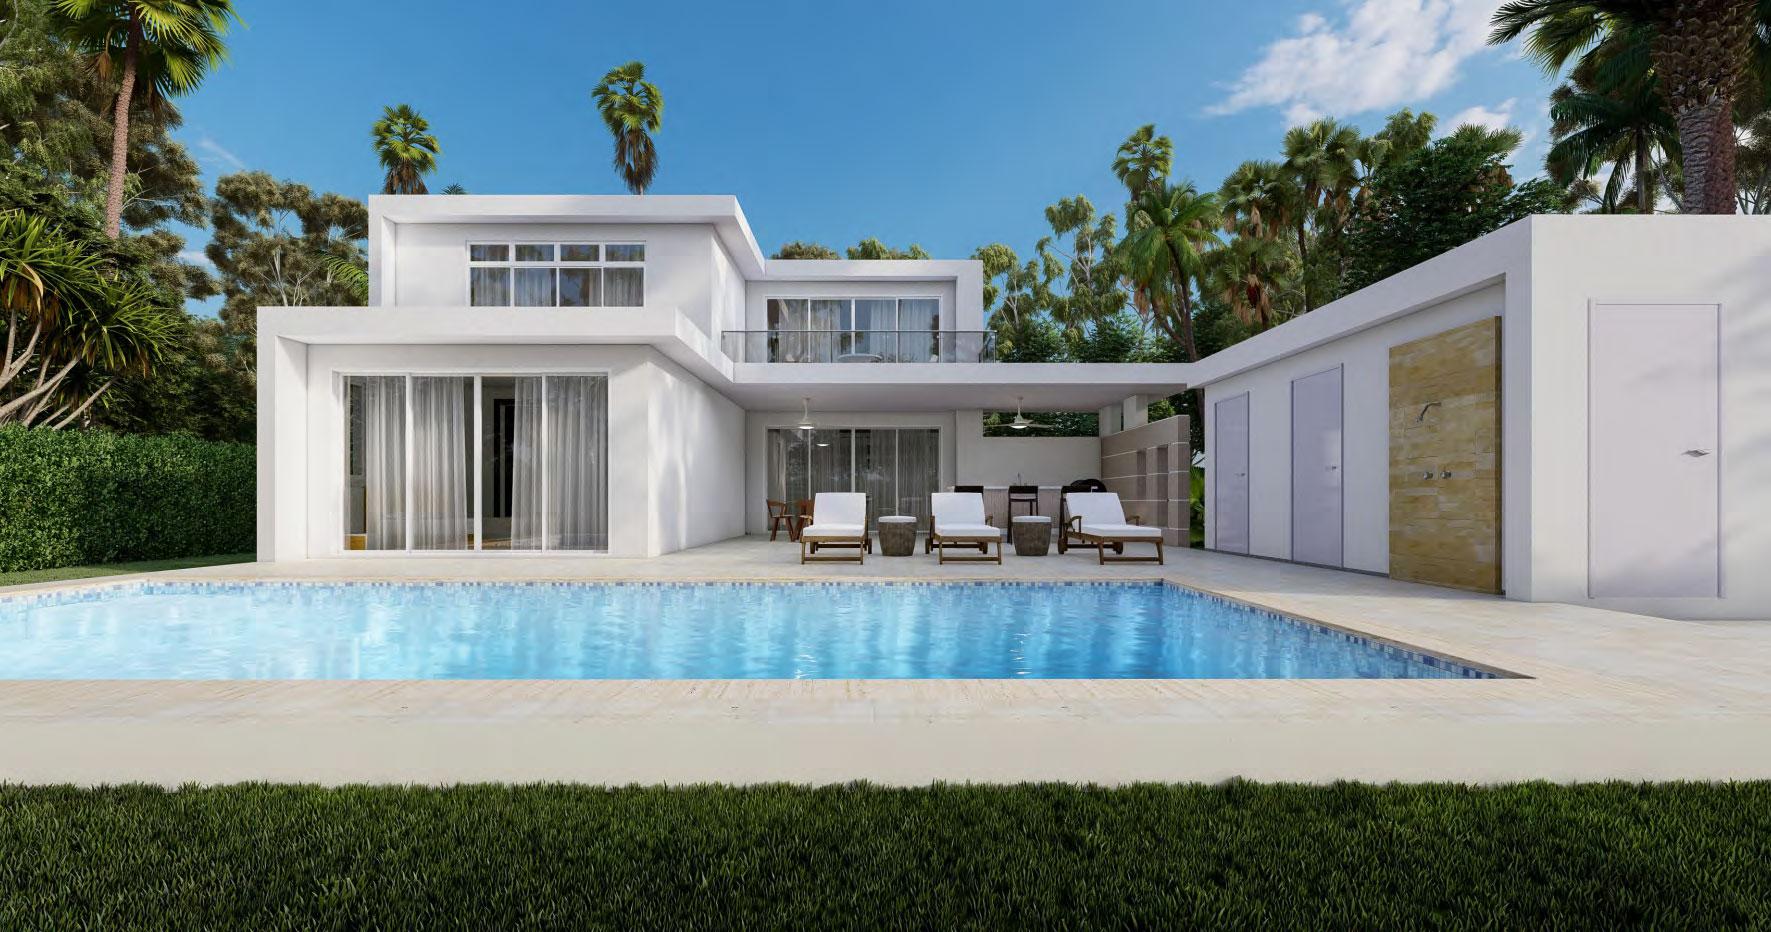 Villa Bluepearl by Casa Linda